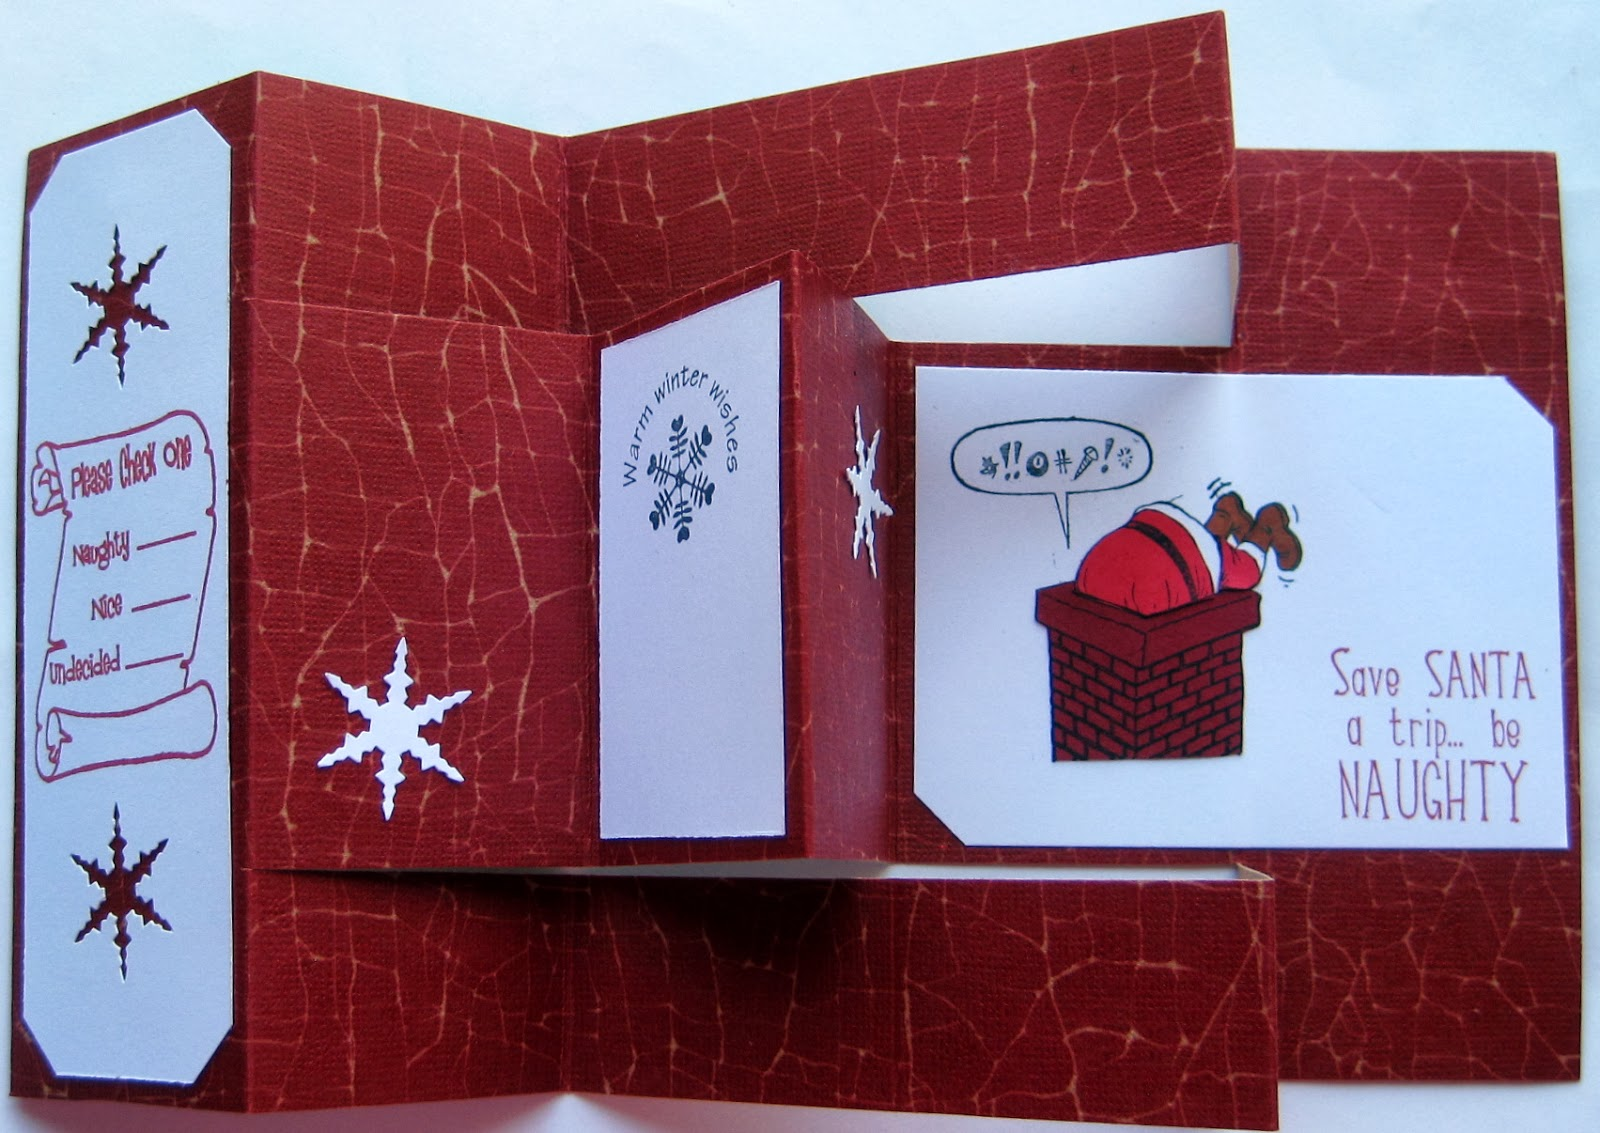 Karens Kreative Kards Tri Shutter Naughty Christmas Card From